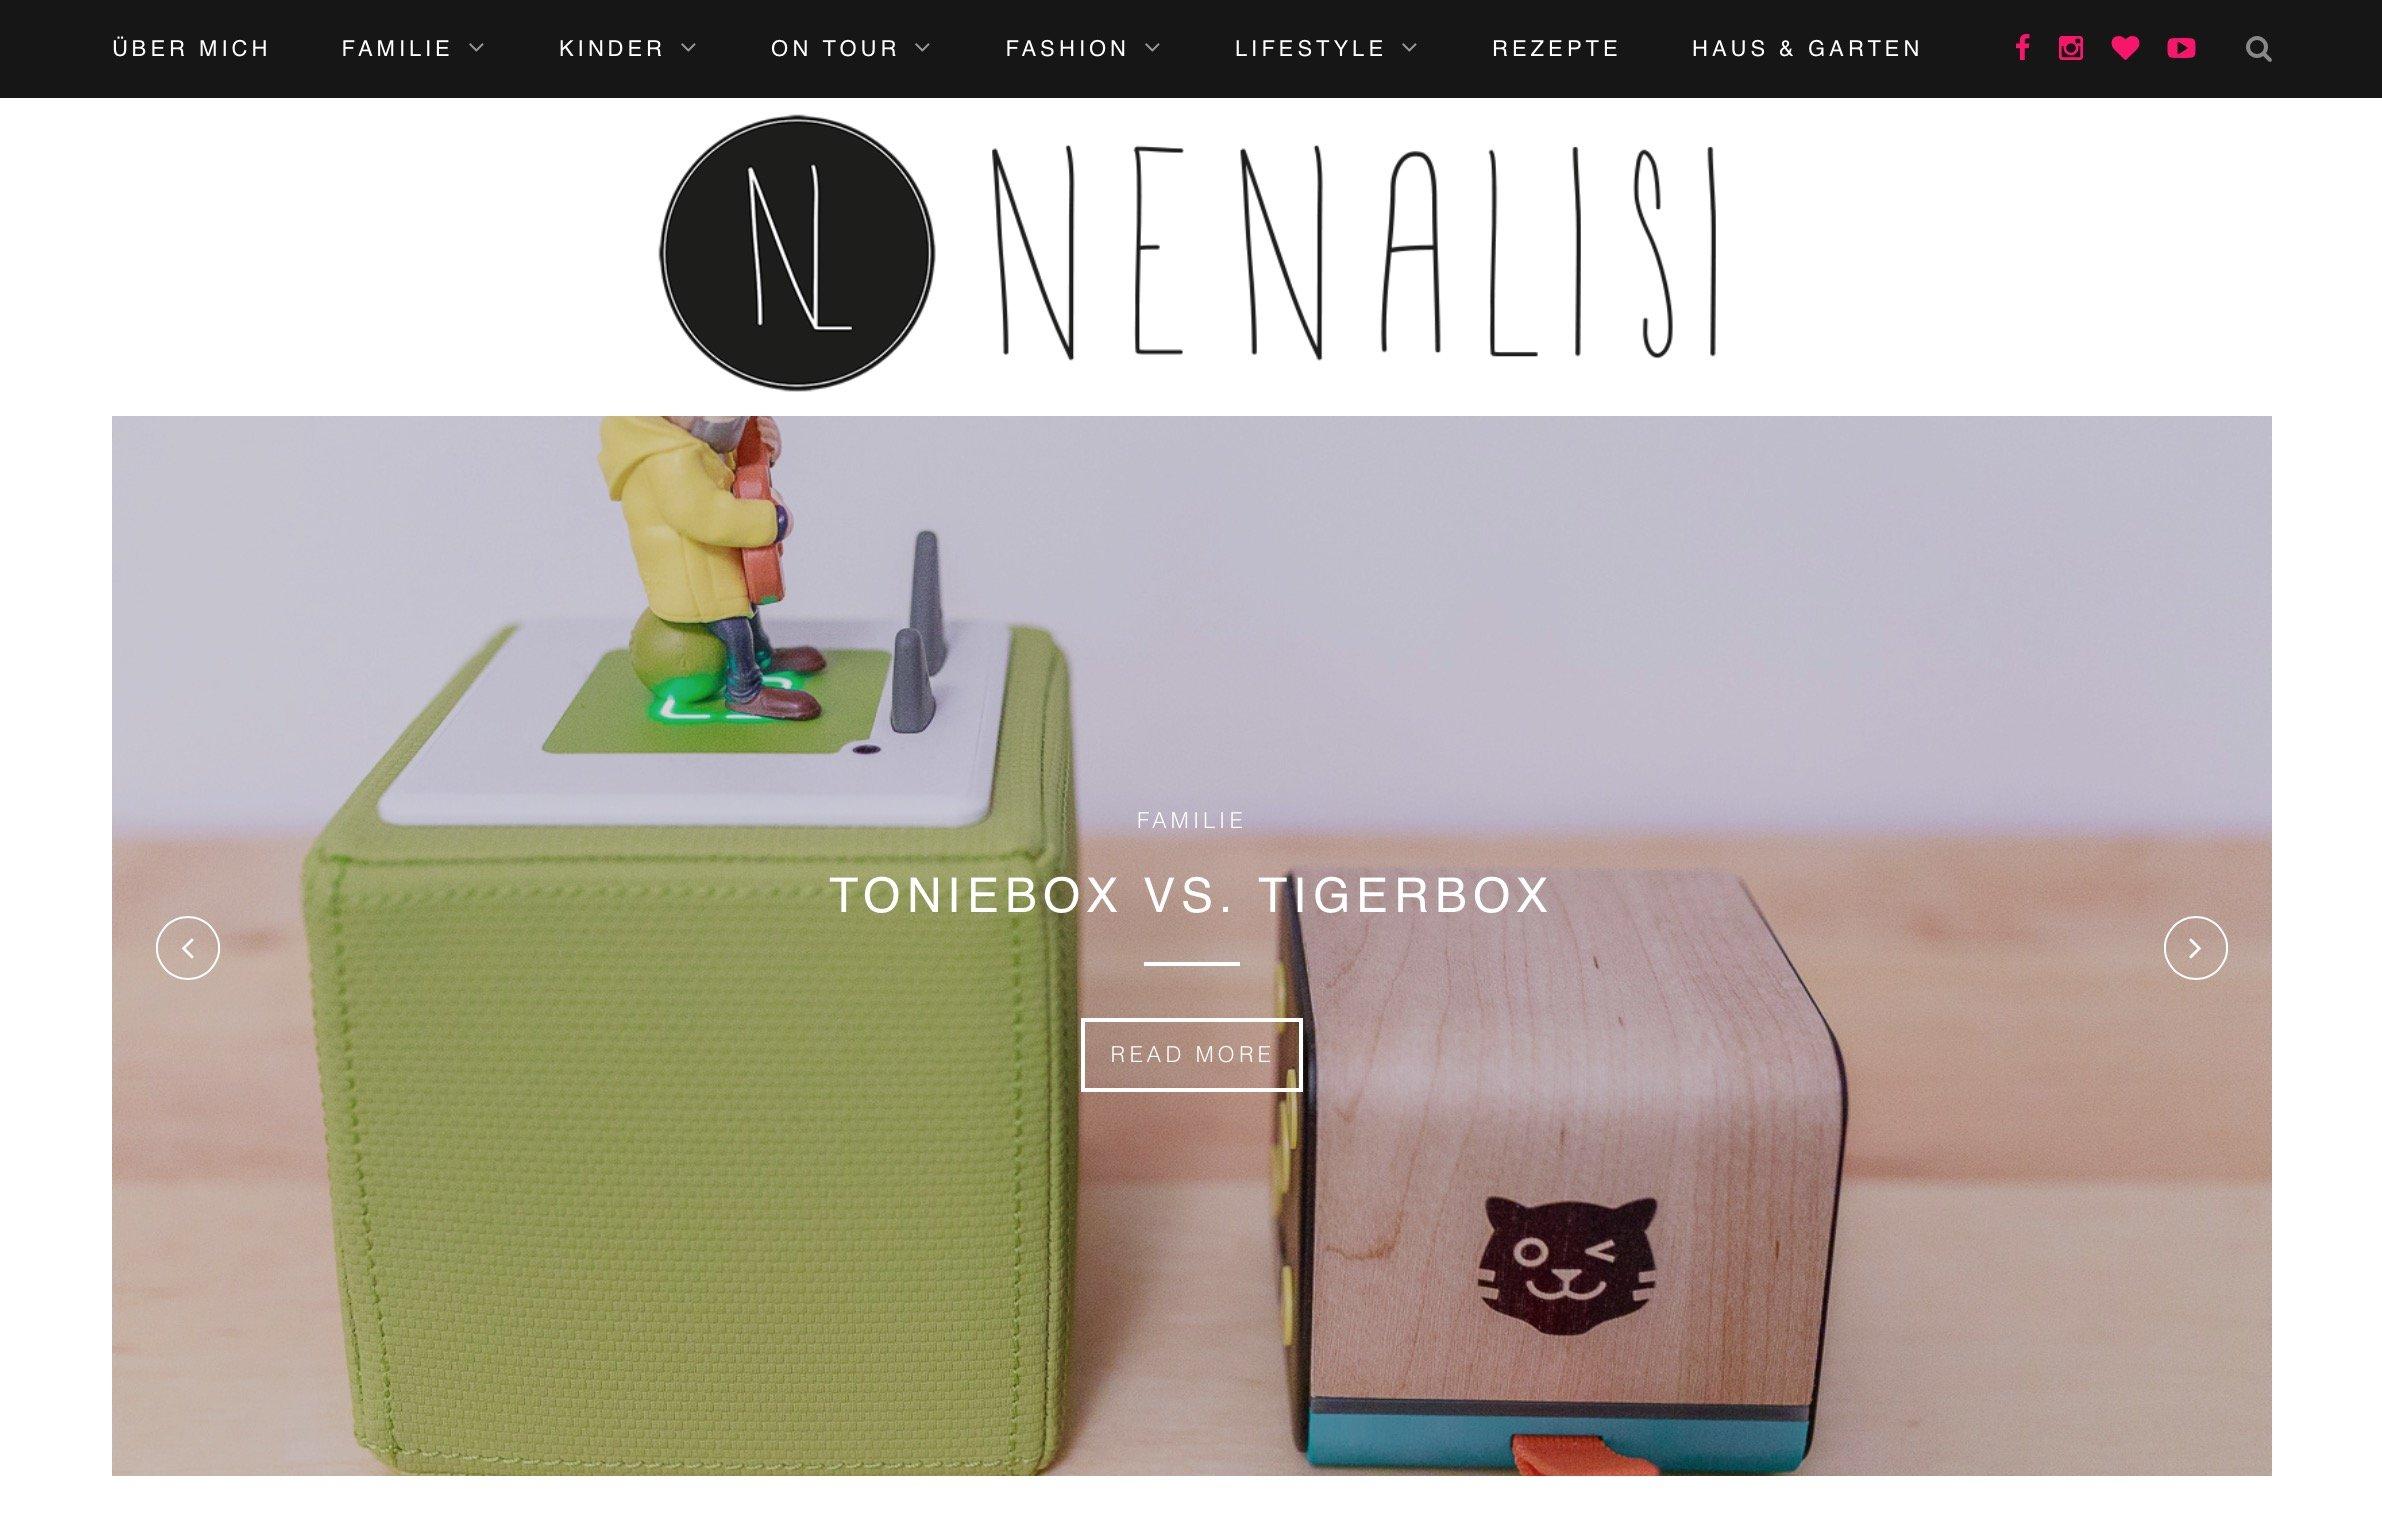 toniebox oder tigerbox